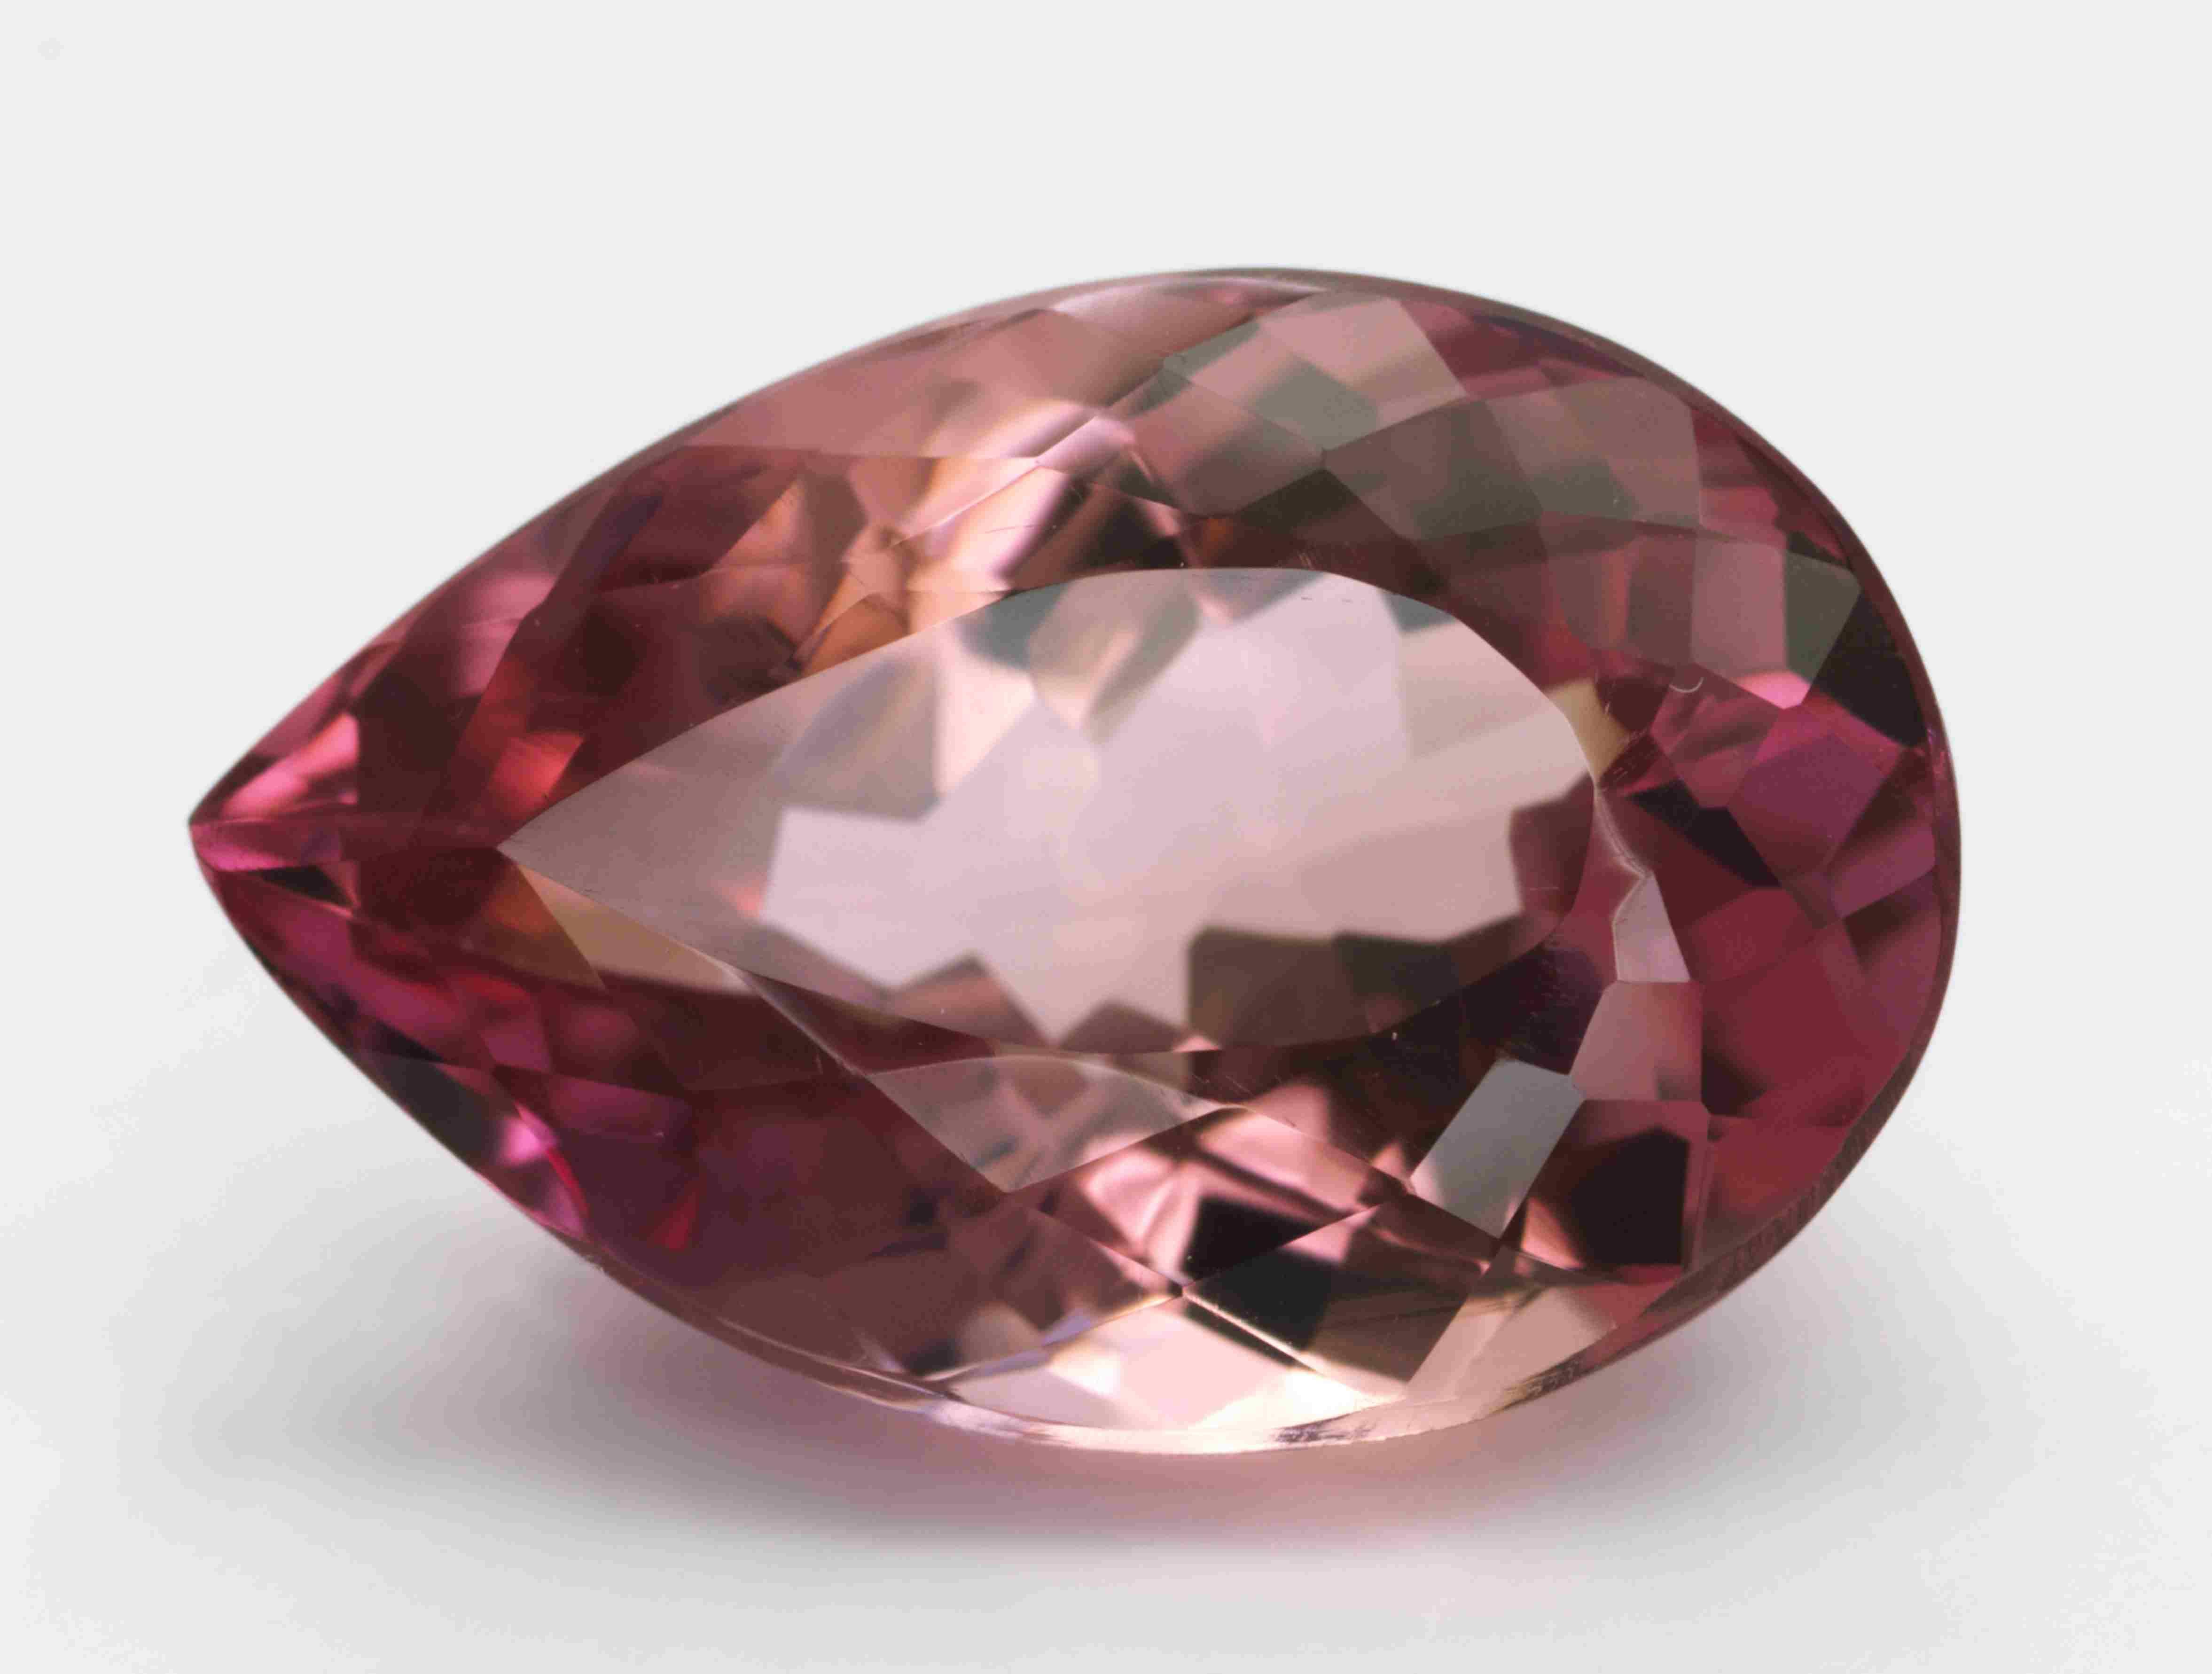 Close up of a red topaz gemstone